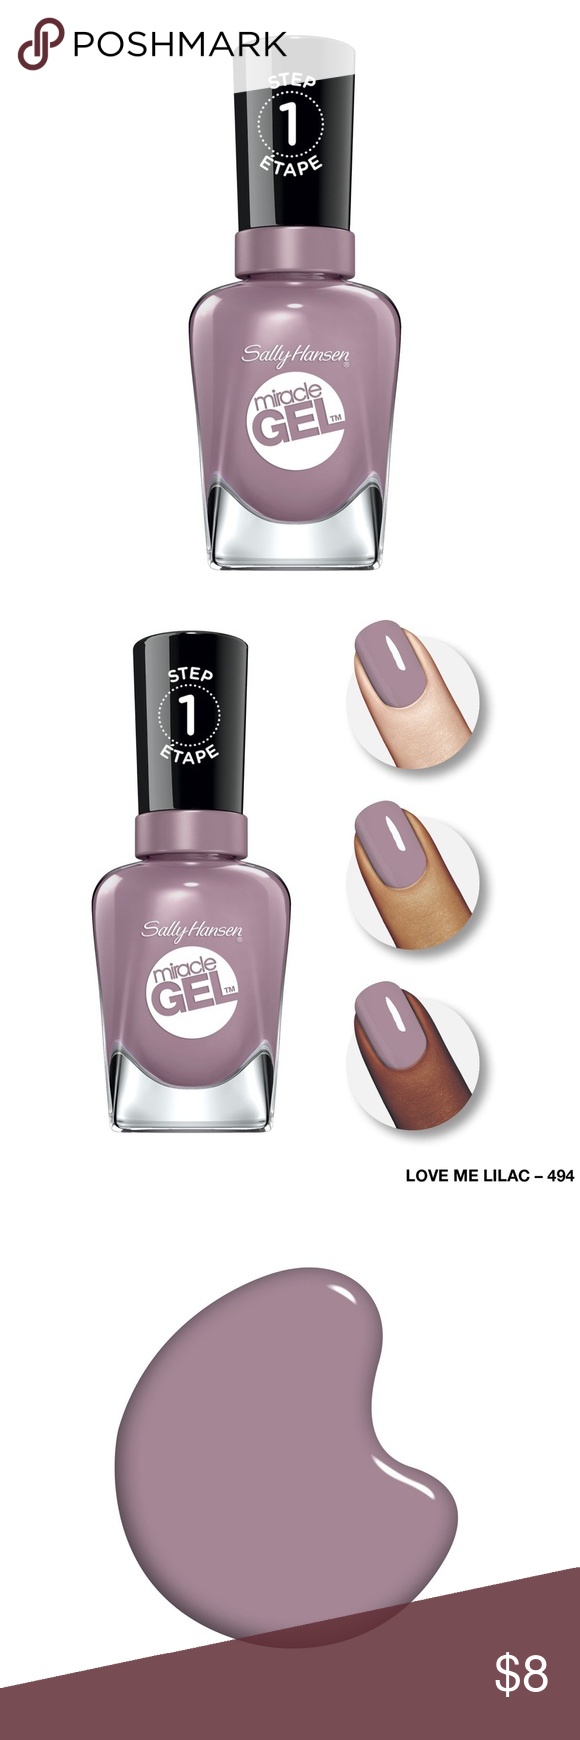 BNWT Sally Hansen Gel Nail Polish in Love Me Lilac Brand